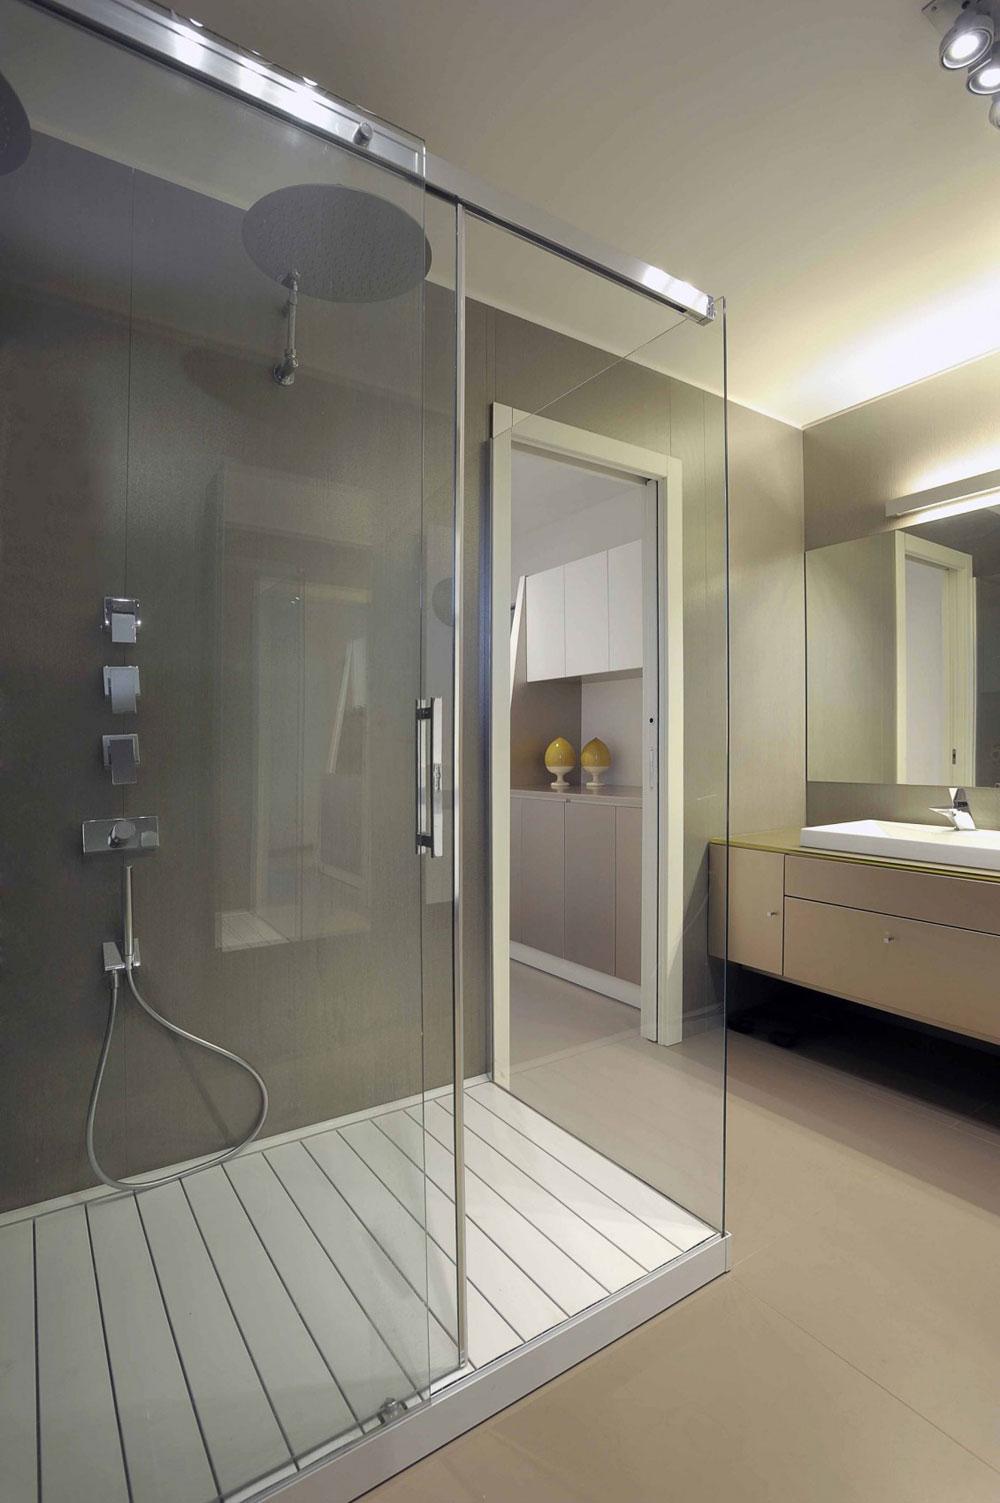 Home-Interior-Design-Bathroom-Ideas-To-Create-Something-